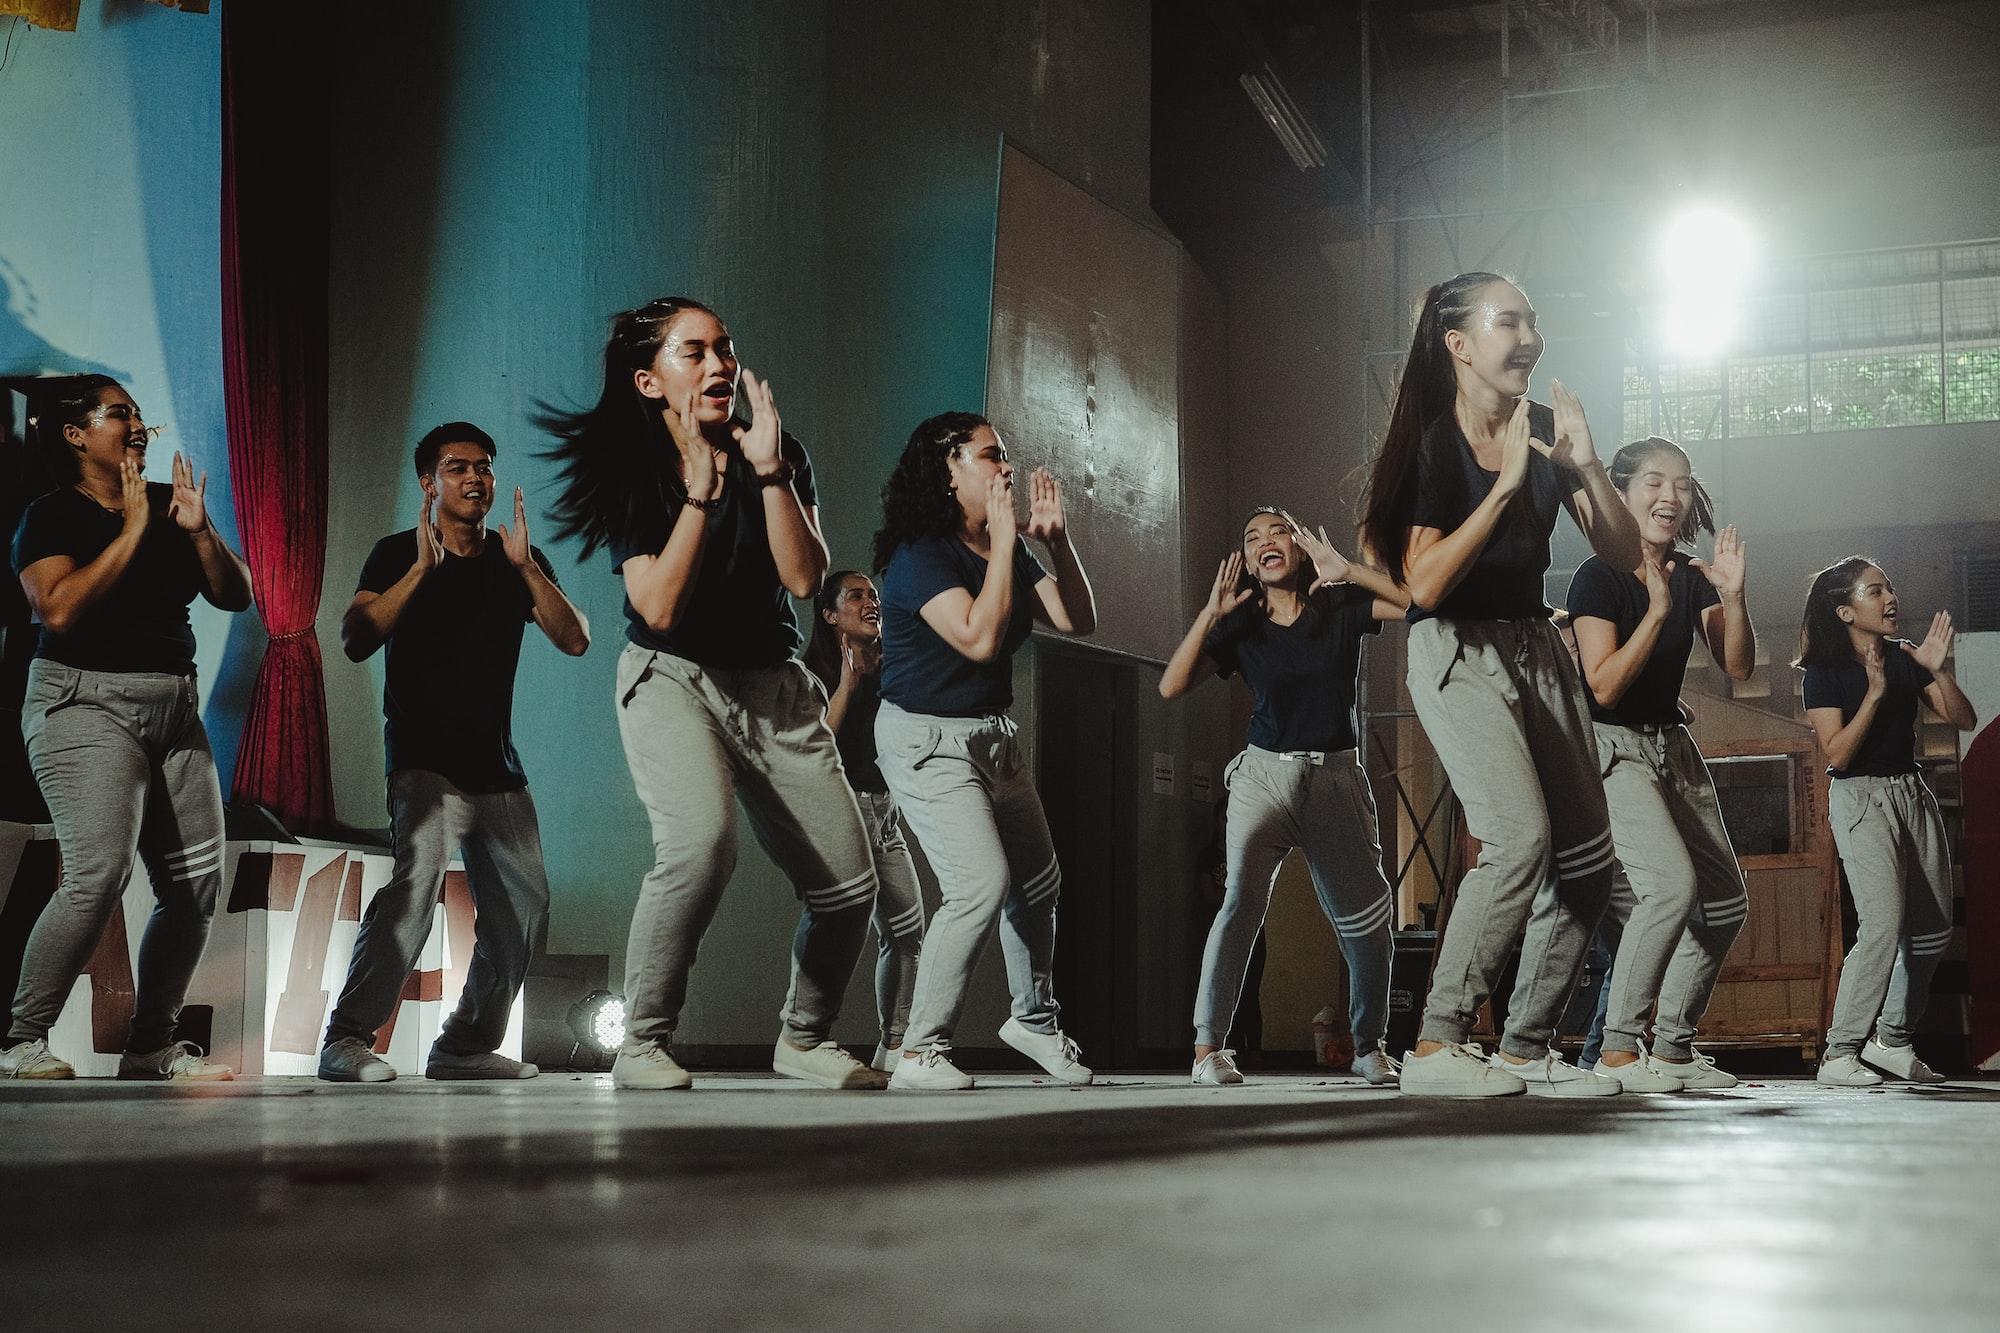 Dance Group Chant